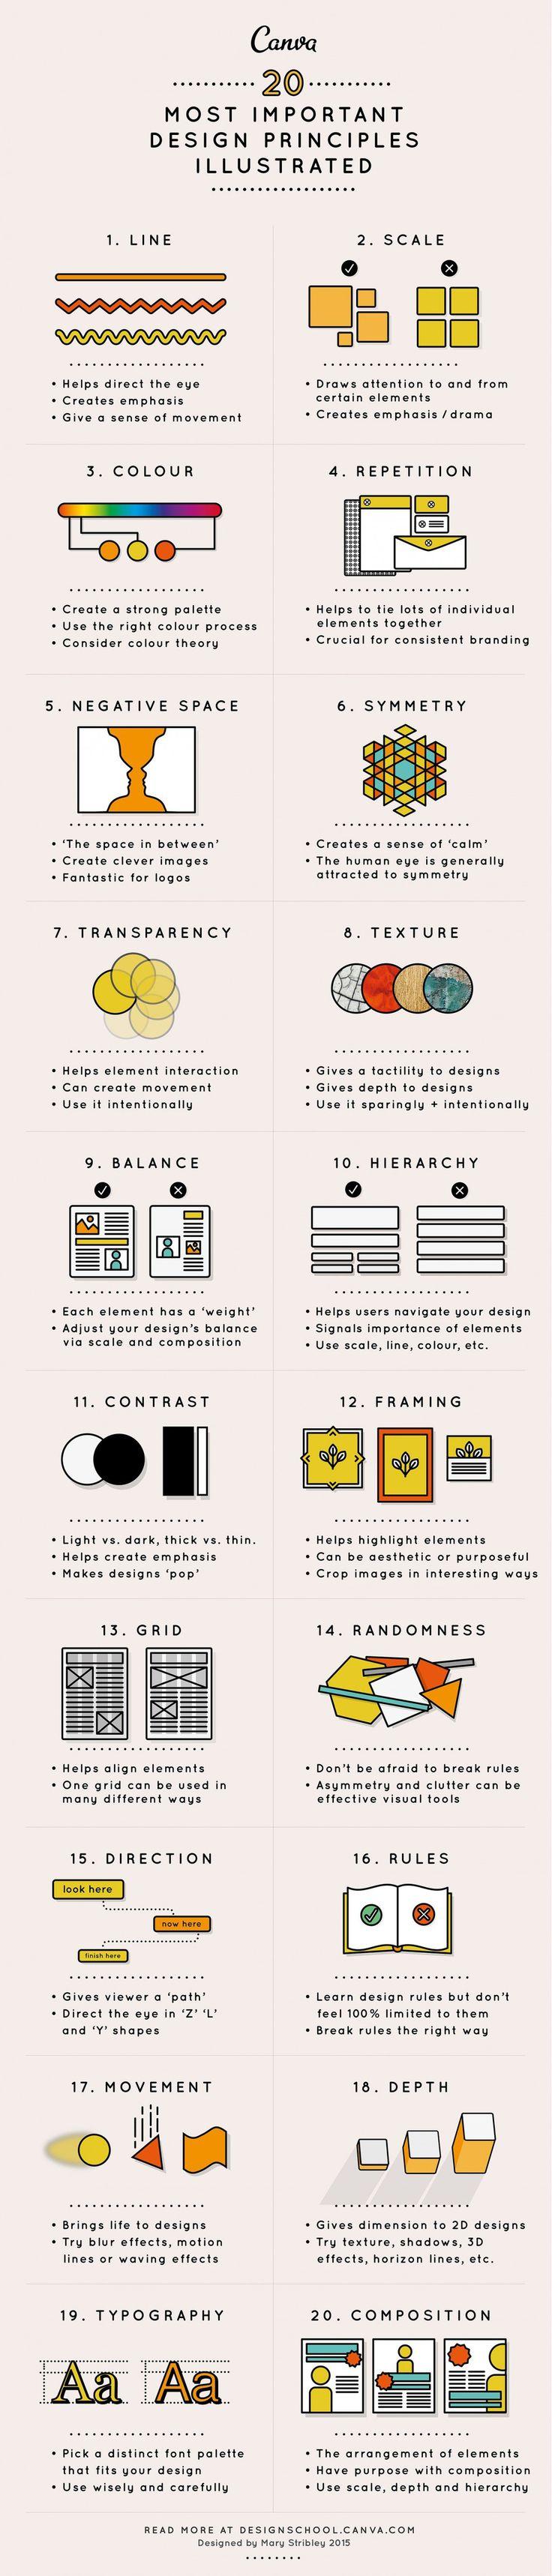 Poster design principles - Poster Design Layout Principles Design Elements And Principles Tips And Inspiration By Canva Download